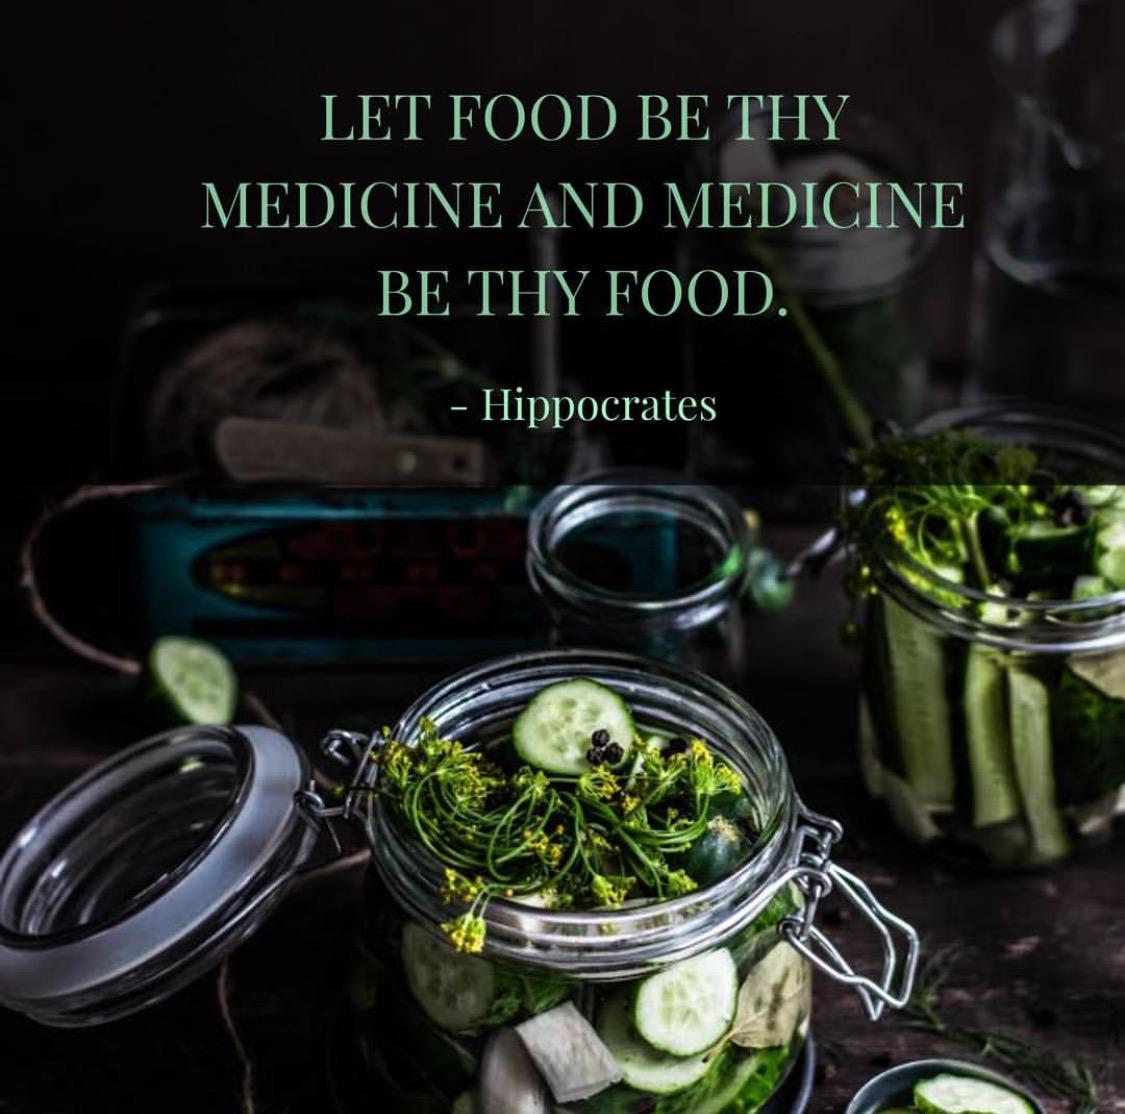 Probiotics are not necessarily harmless